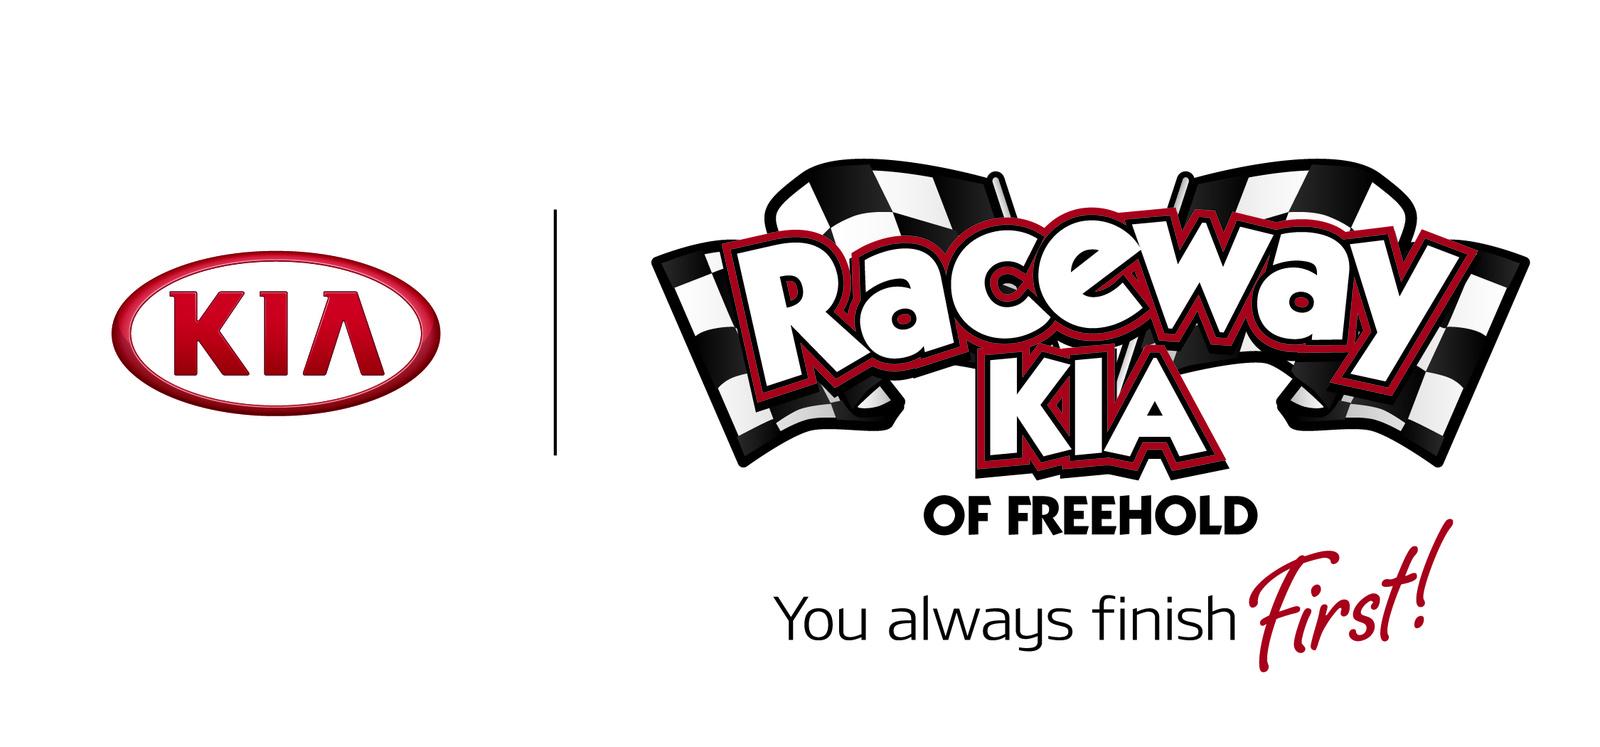 Raceway Kia Of Freehold Freehold Nj Lee Evaluaciones